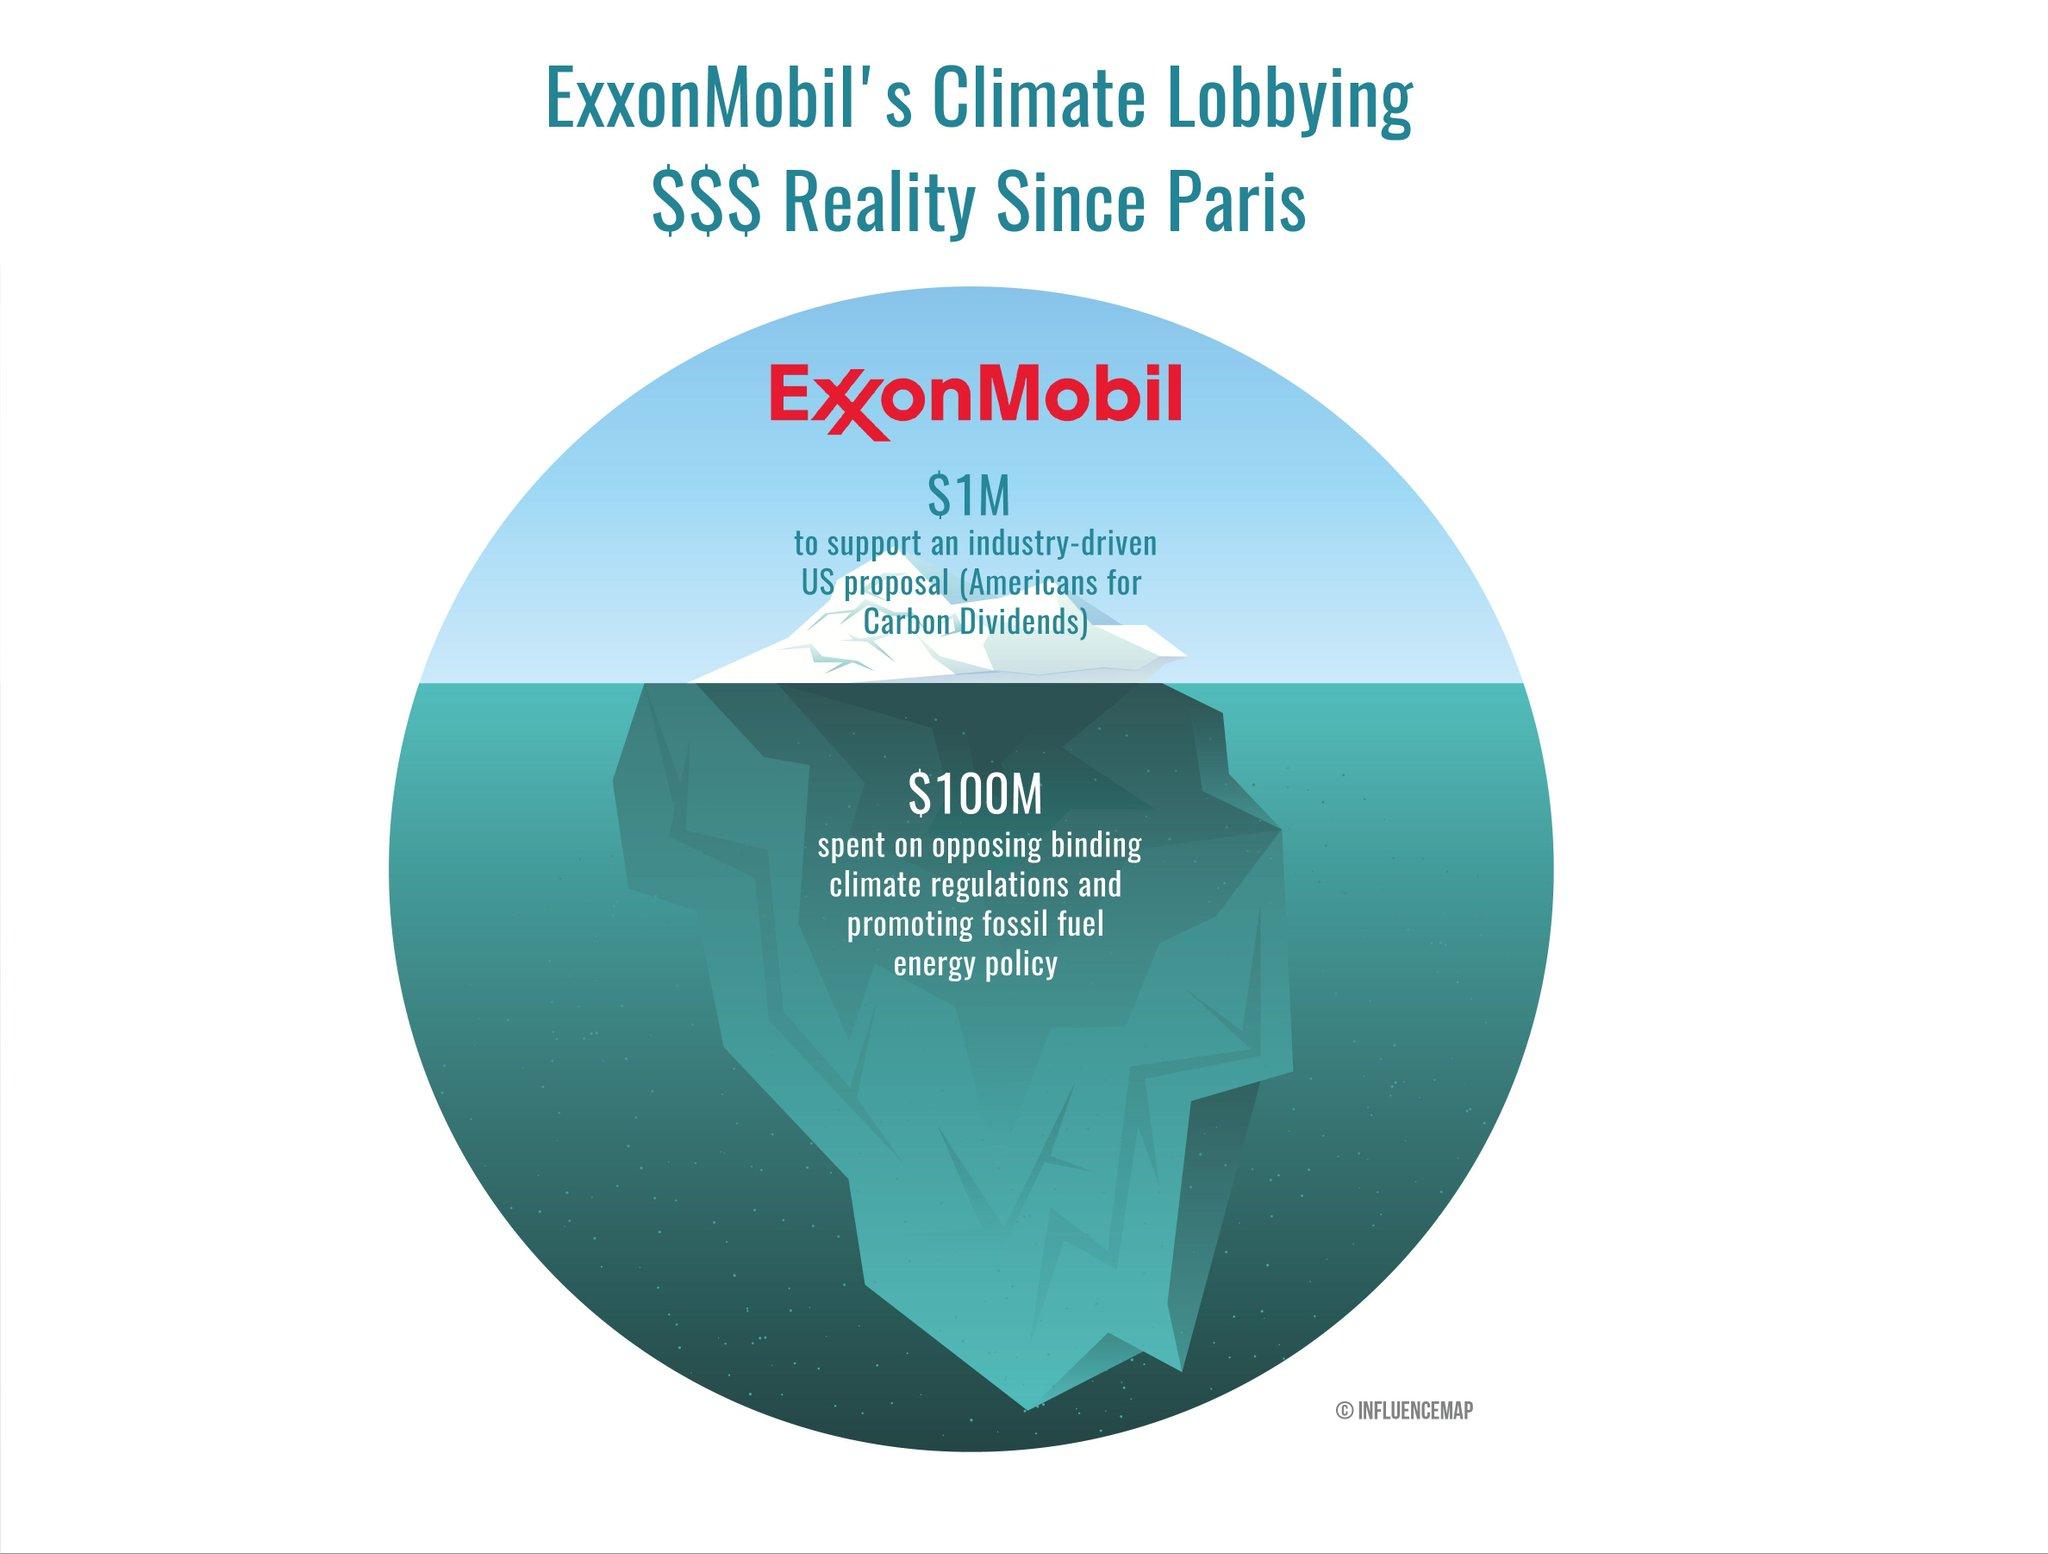 EU Parliamentarians buckle under ExxonMobil lobby pressure